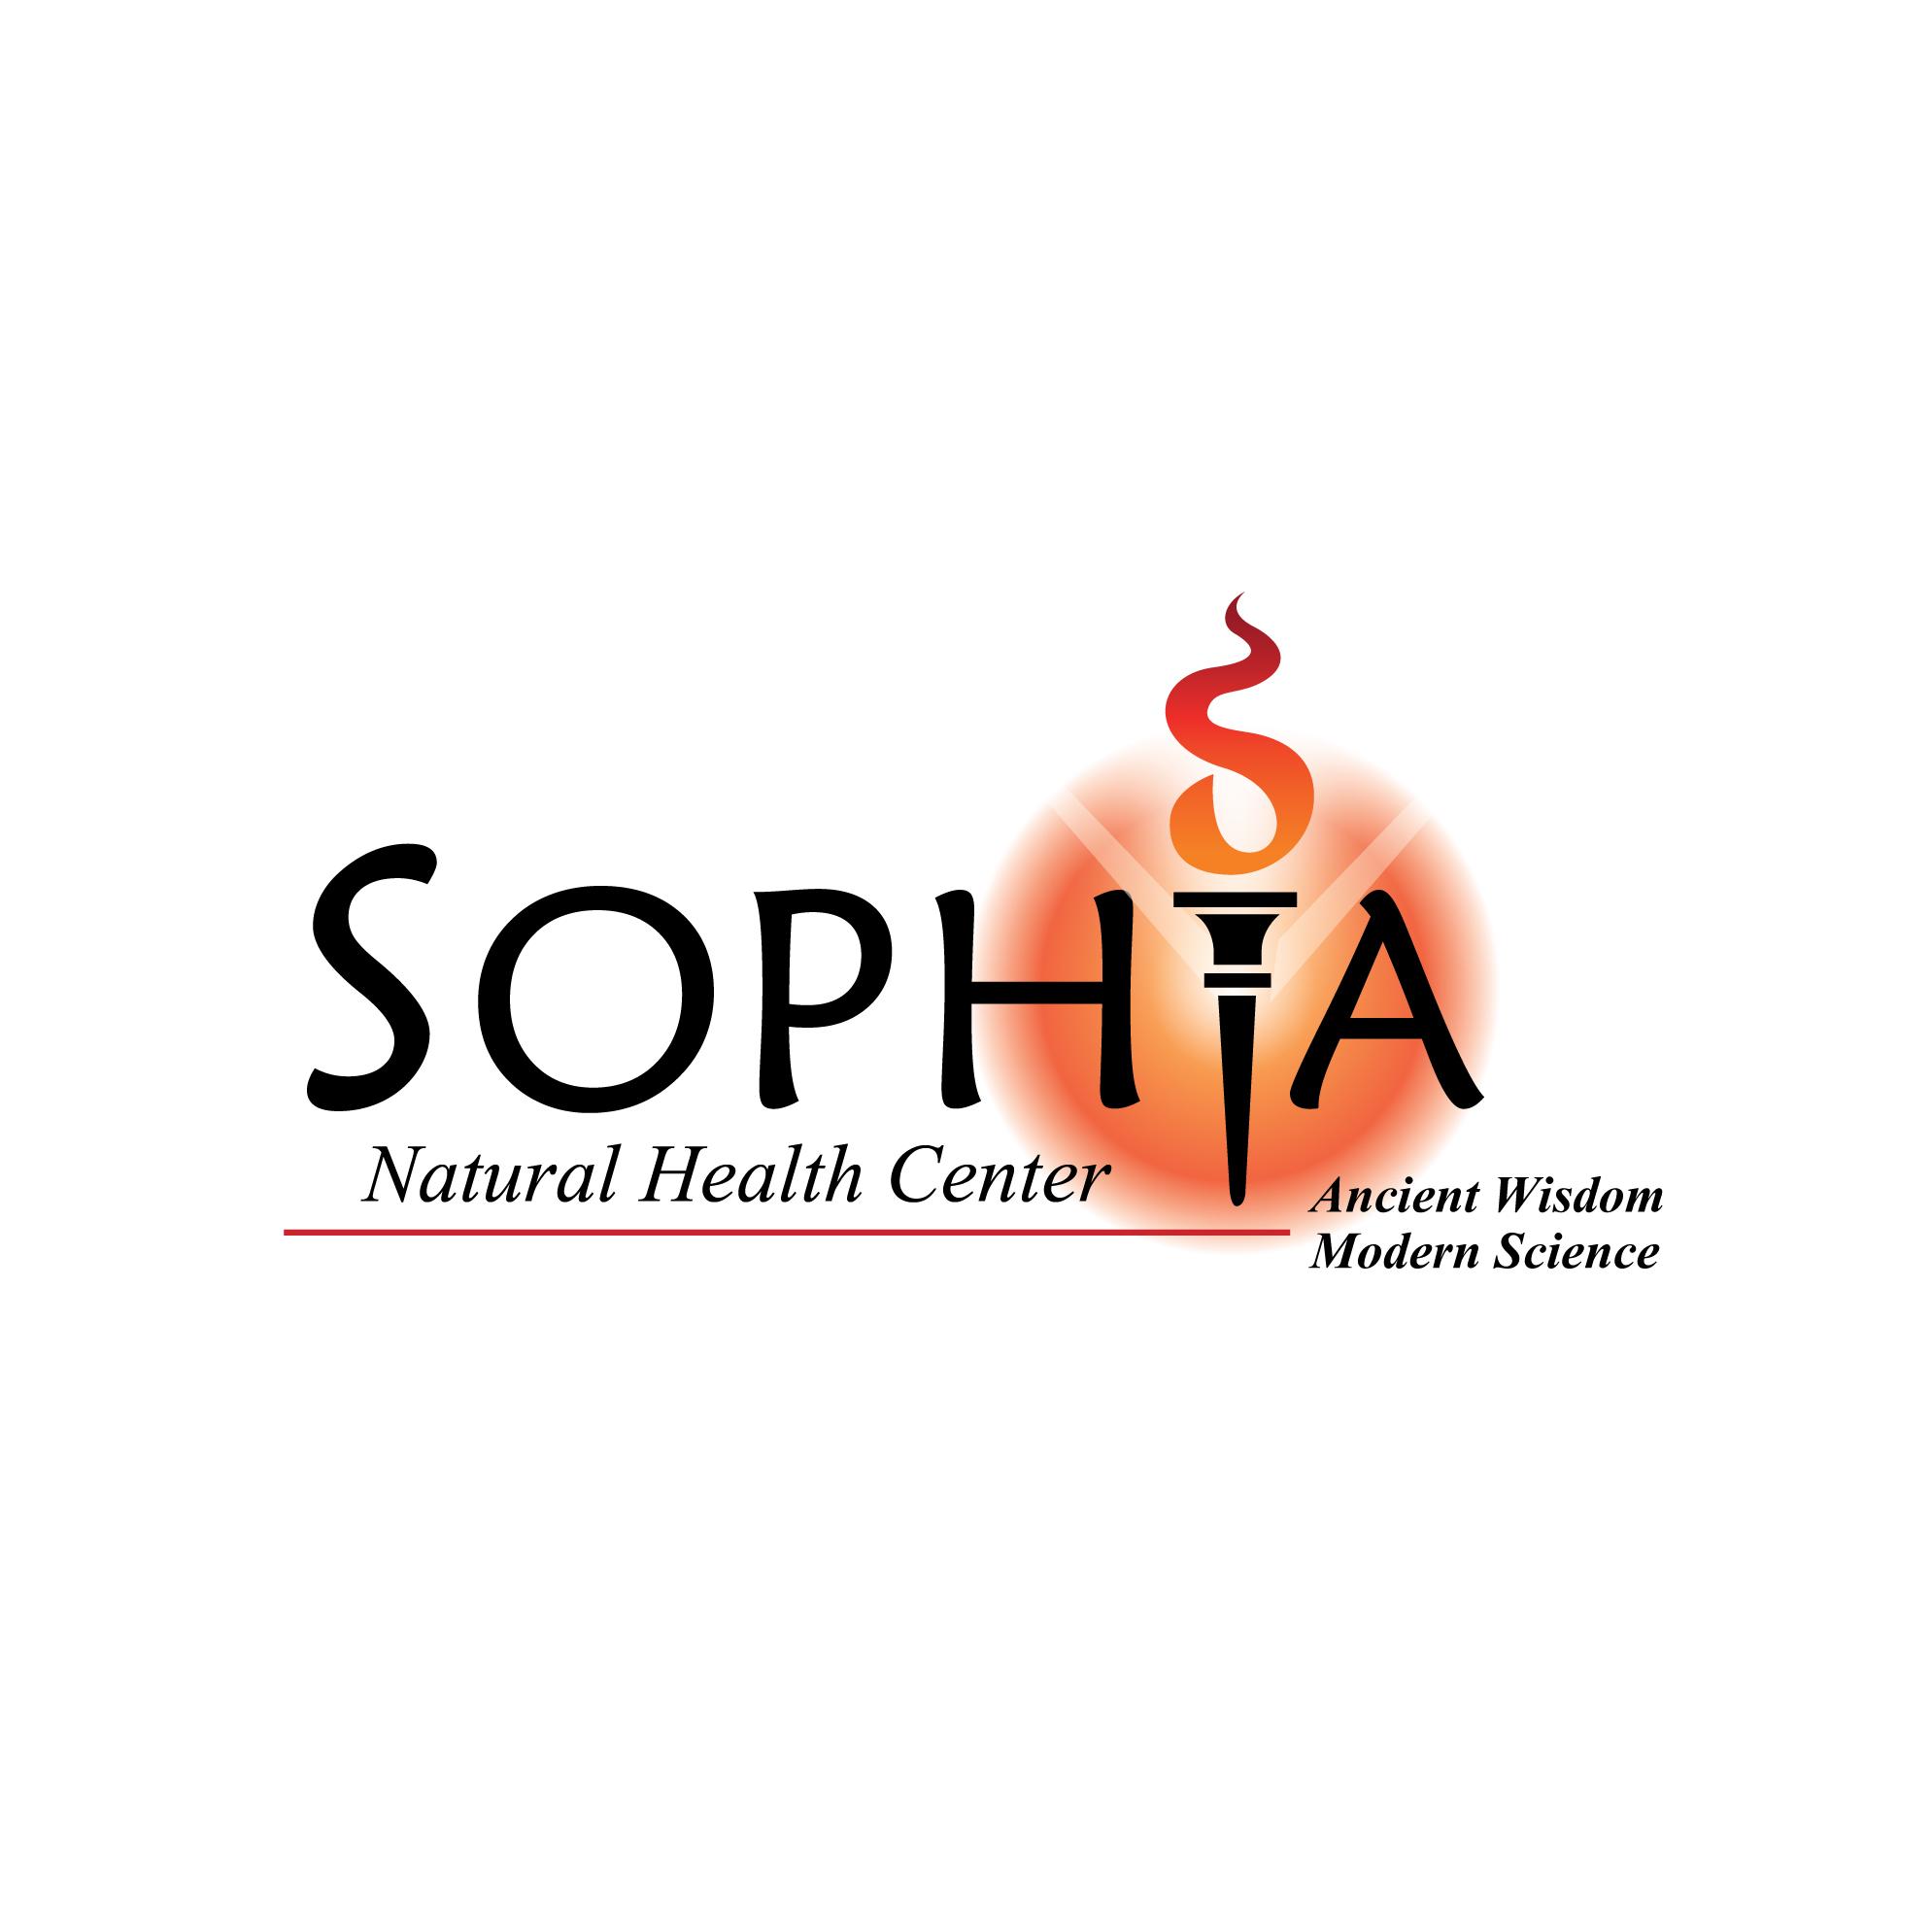 Sophia Natural Health Center - Integrative Natural Medicine